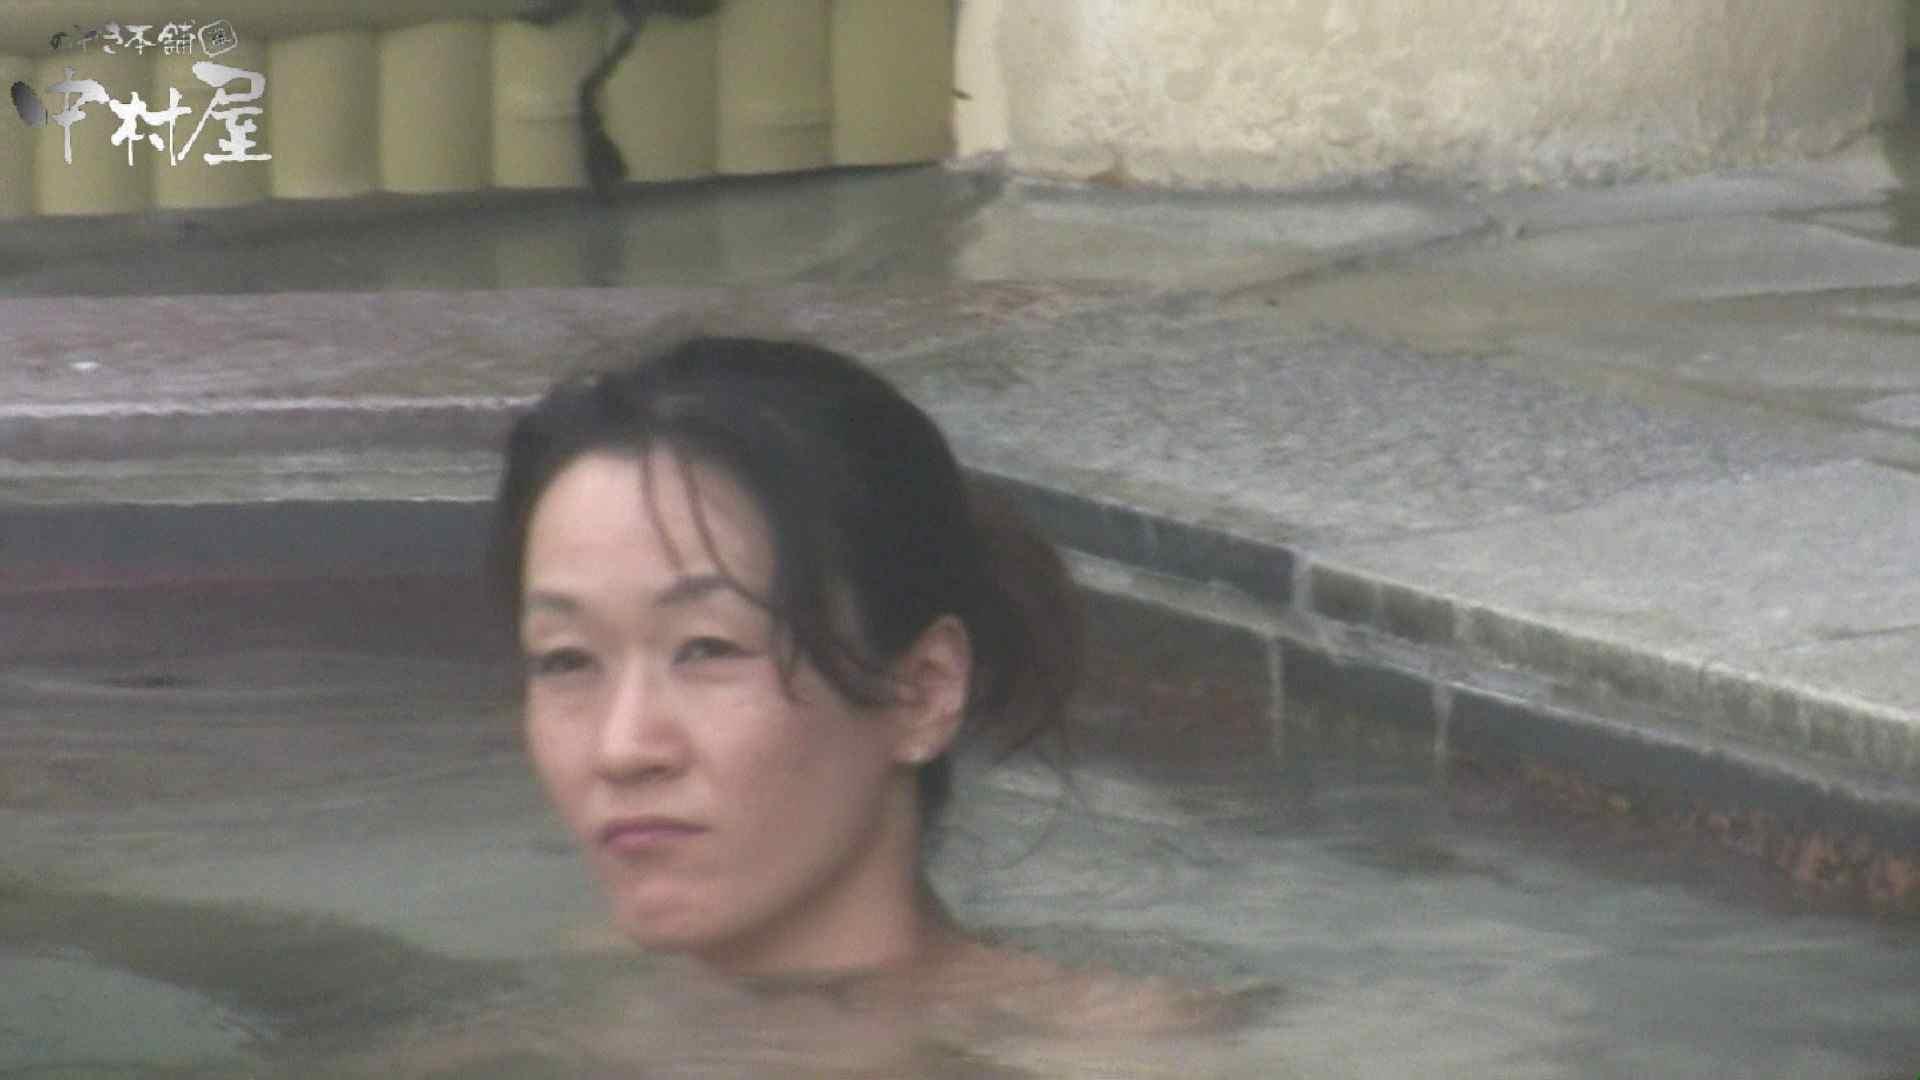 Aquaな露天風呂Vol.928 露天風呂突入 | 盗撮師作品  72pic 10